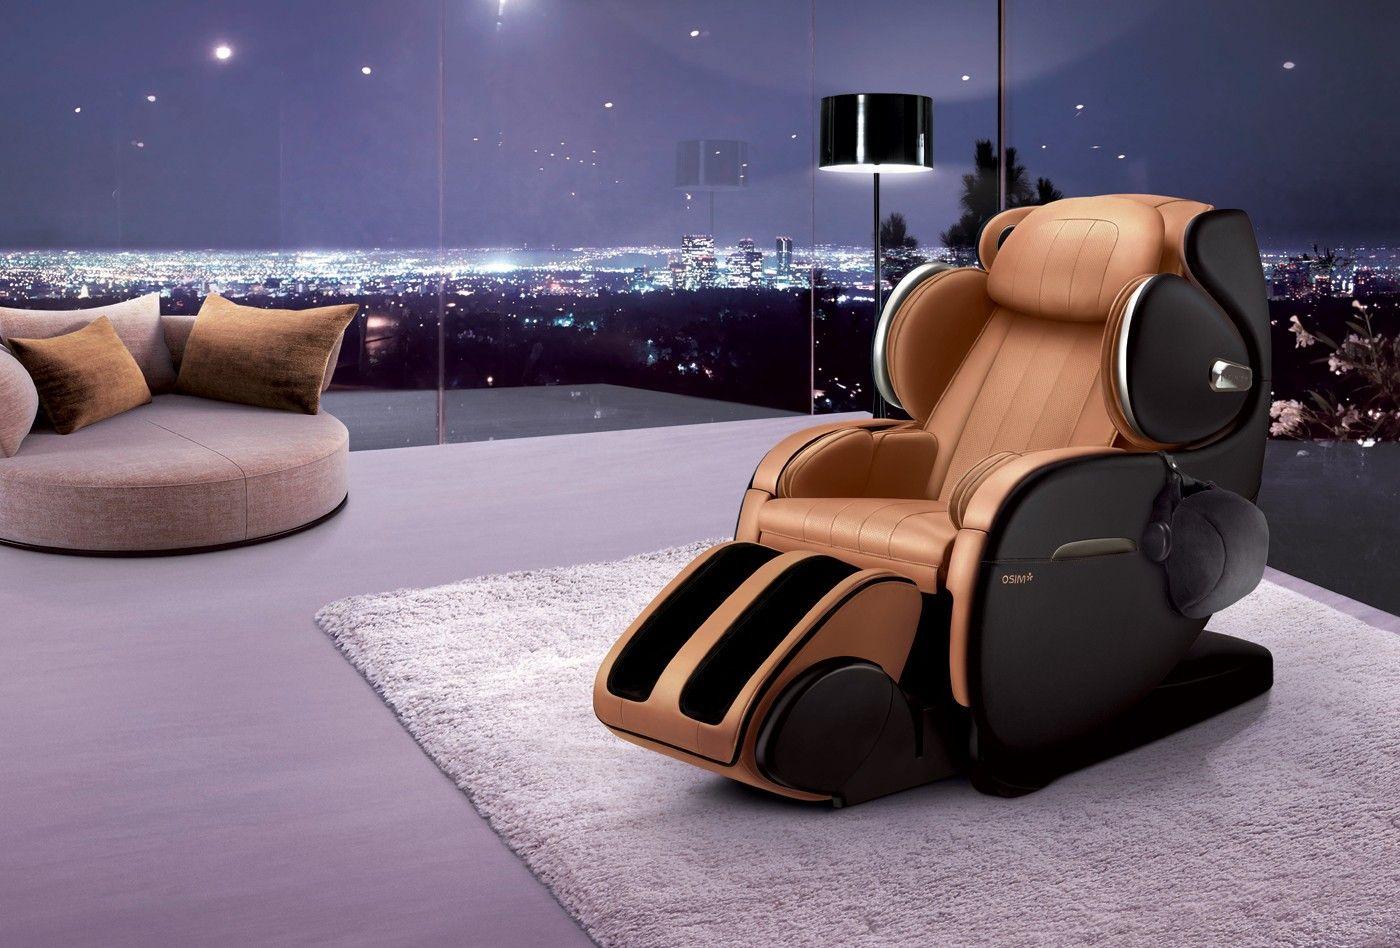 Massage Chair, uInfinity Luxe OSIM Singapore Massage